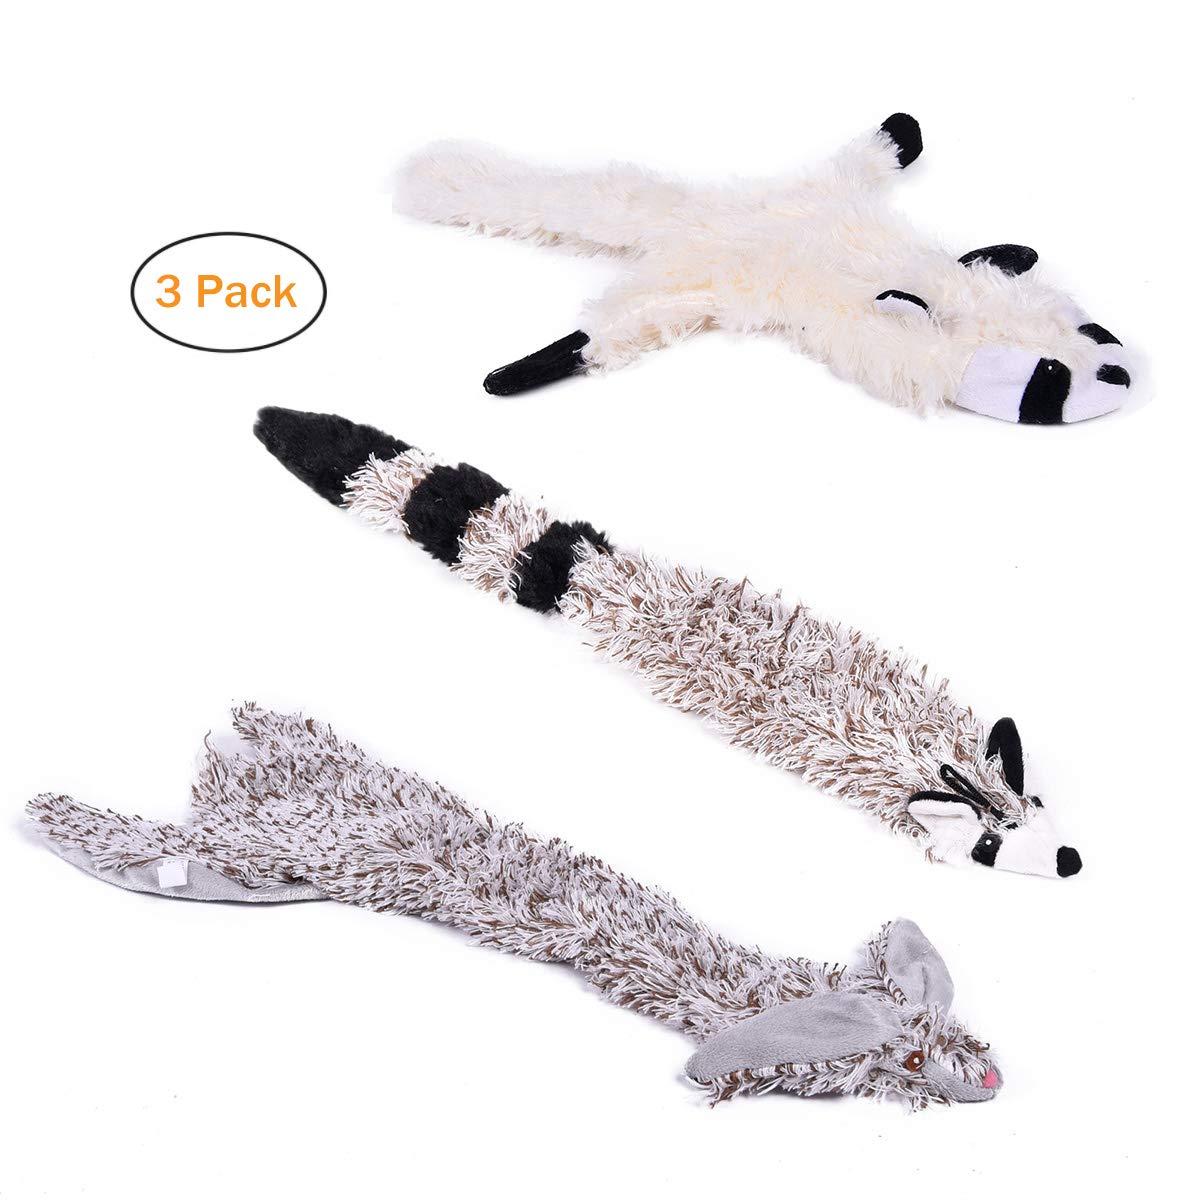 PAWZ Road Dog Chew Toys, 3 PCS Pet Dog Plush Squeaking Chew Toy Training Squeaky Toys